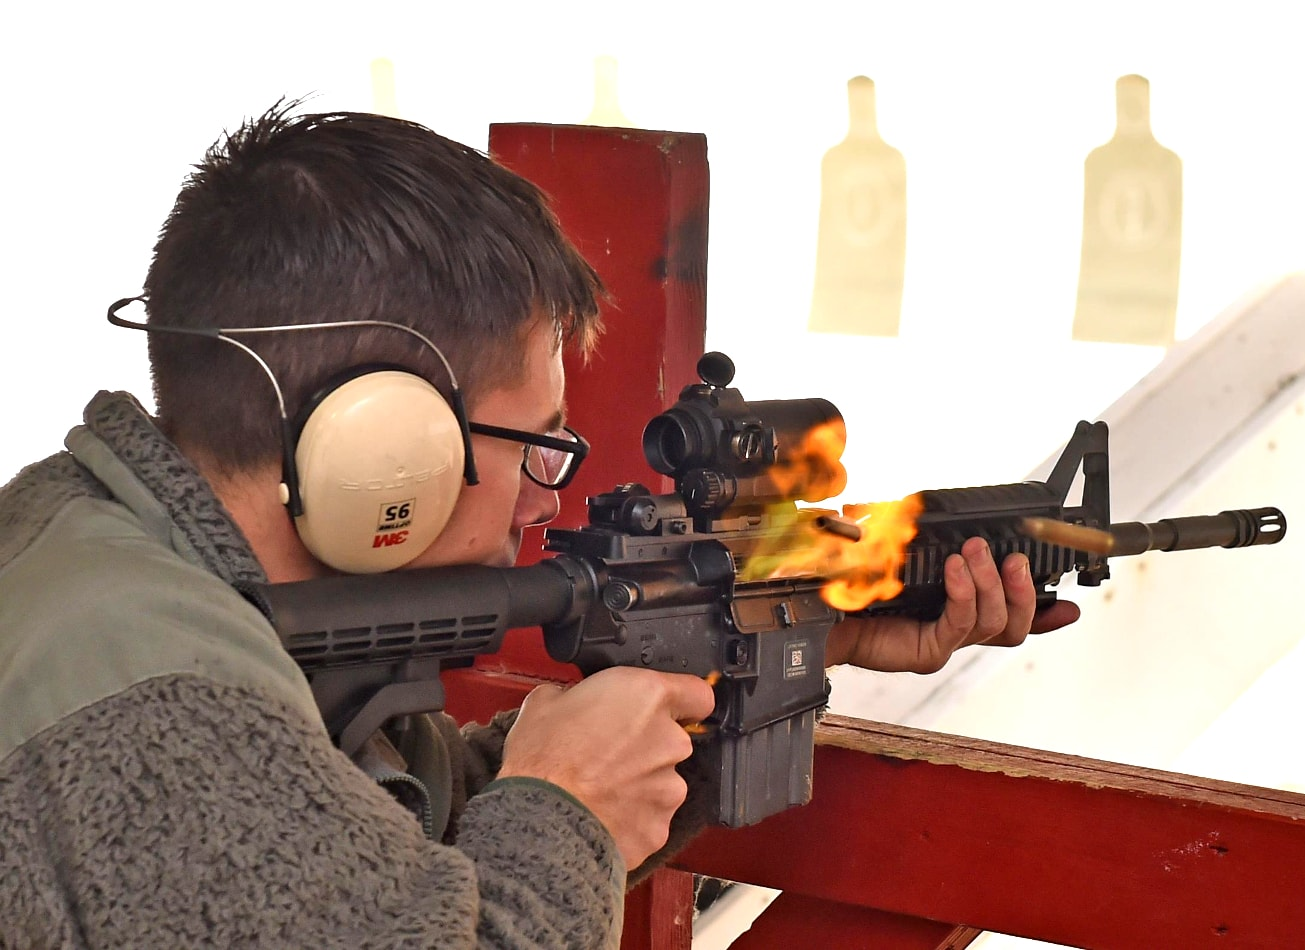 shooting 3 armes glock uzi m4 varsovie activites vimigo